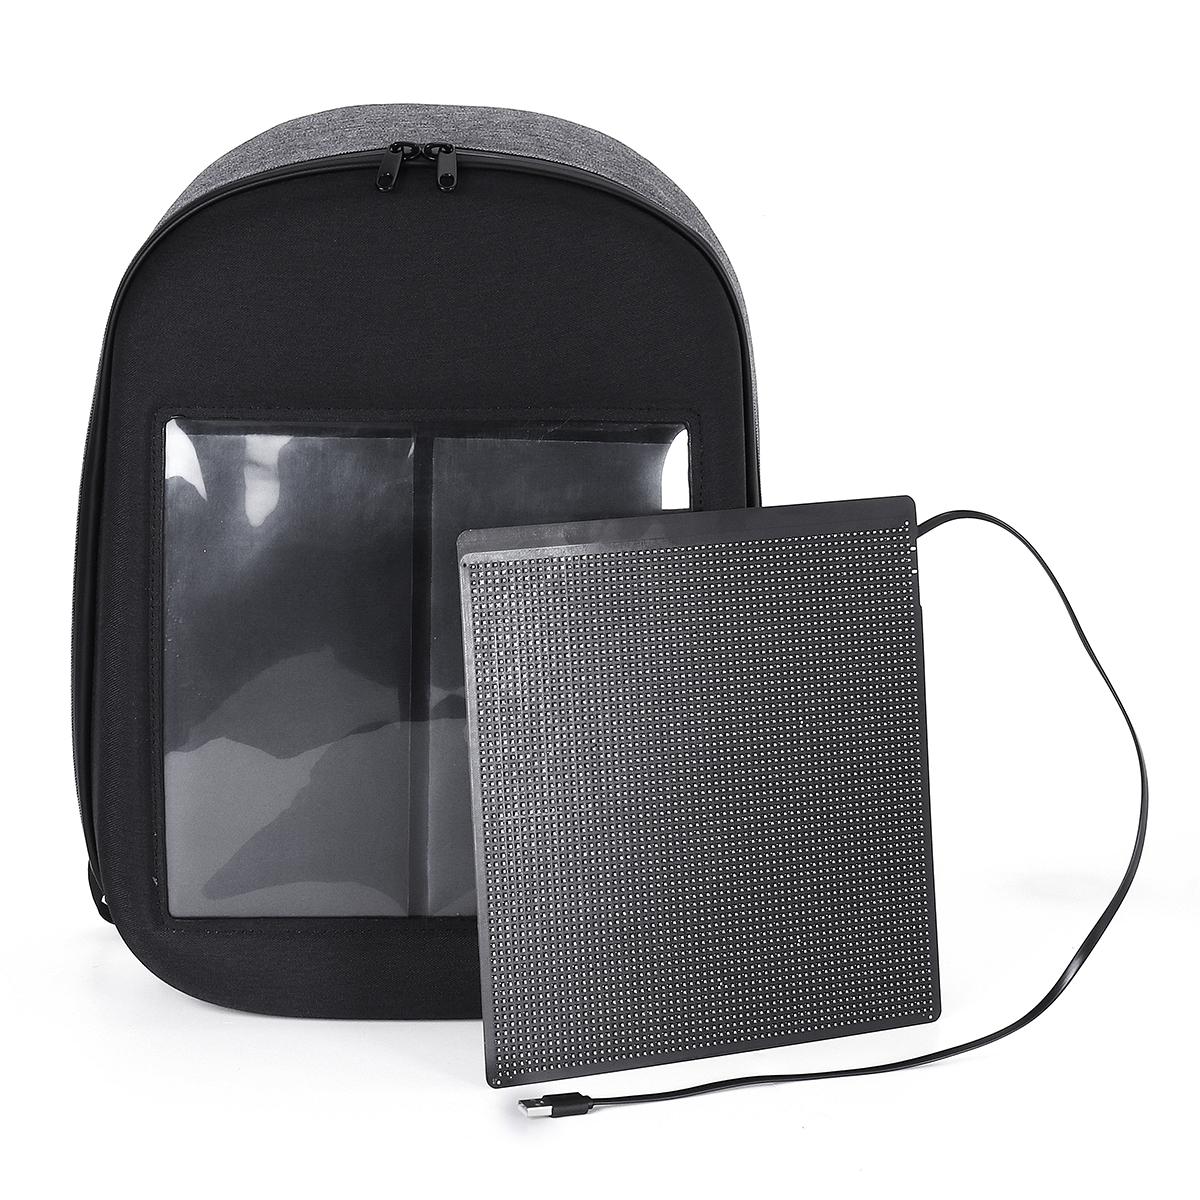 DC 5V LED Dynamic Display WiFi Backpack Laptop Notebook ...